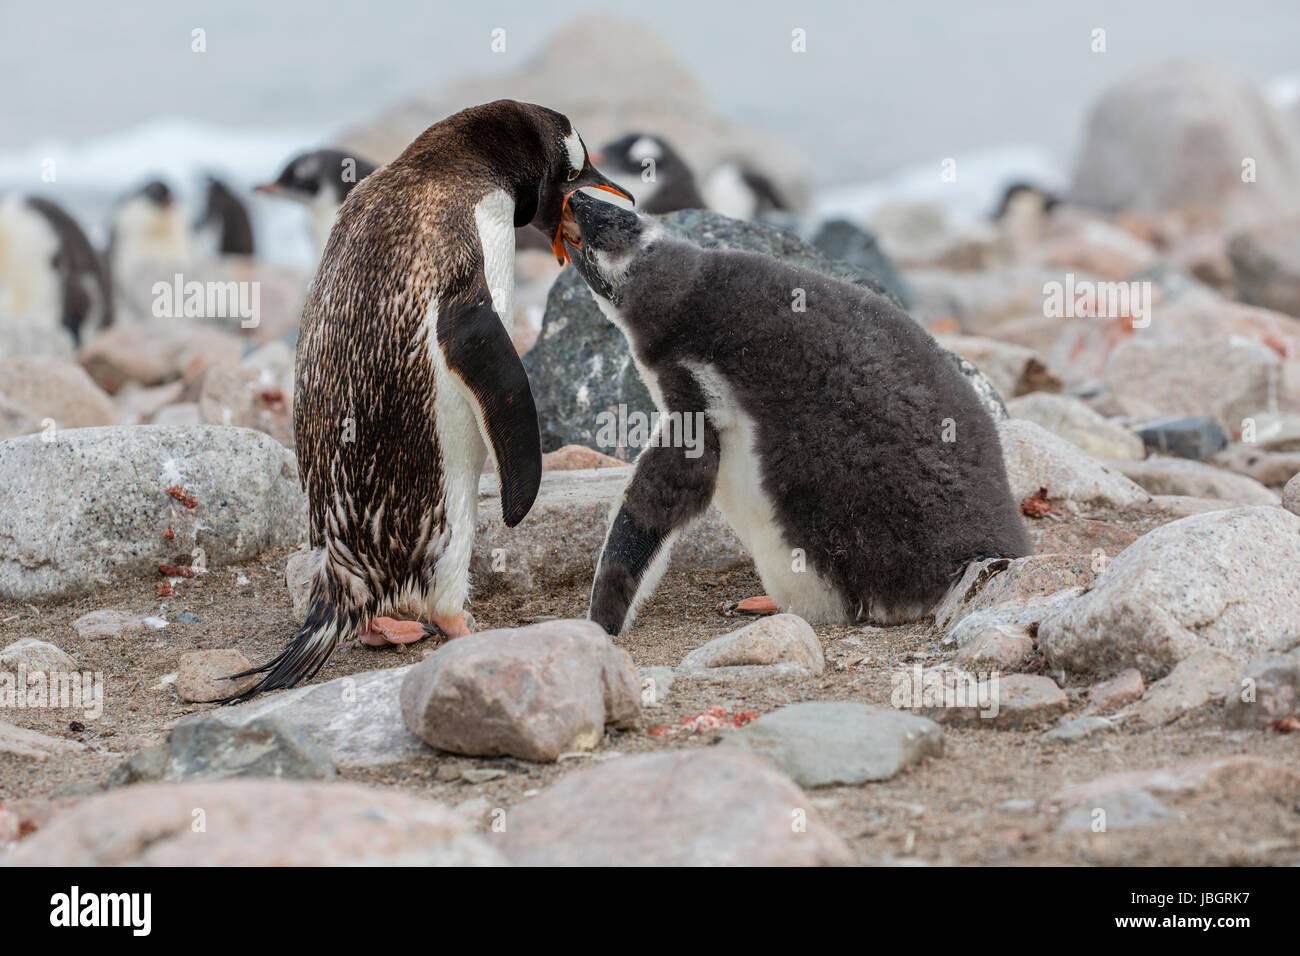 Gentoo penguin feeding her chick at Dorian Bay, Antarctica - Stock Image